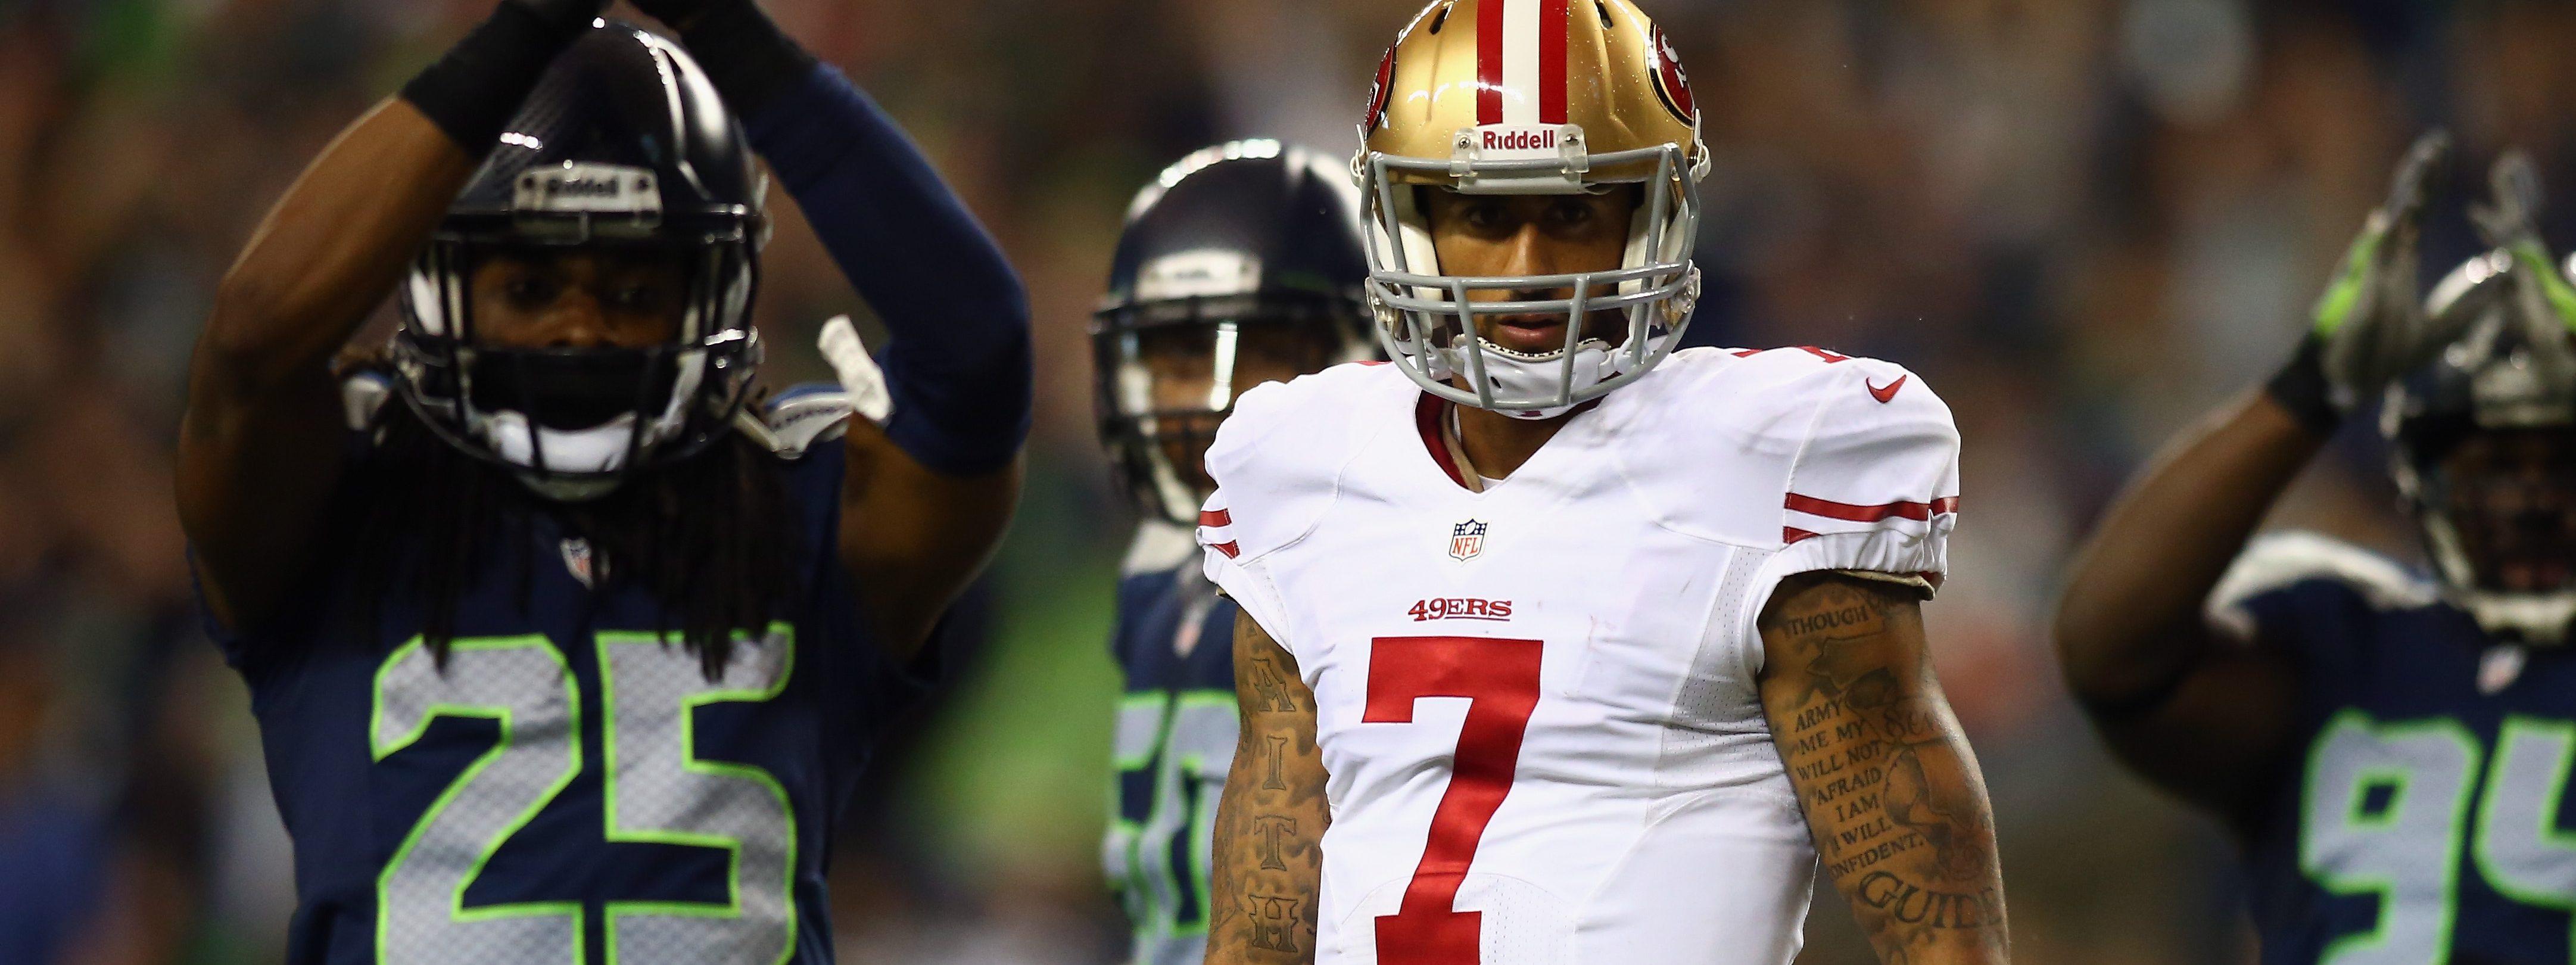 ea92ebf7 Richard Sherman: Redskins QB Mess Proves Teams